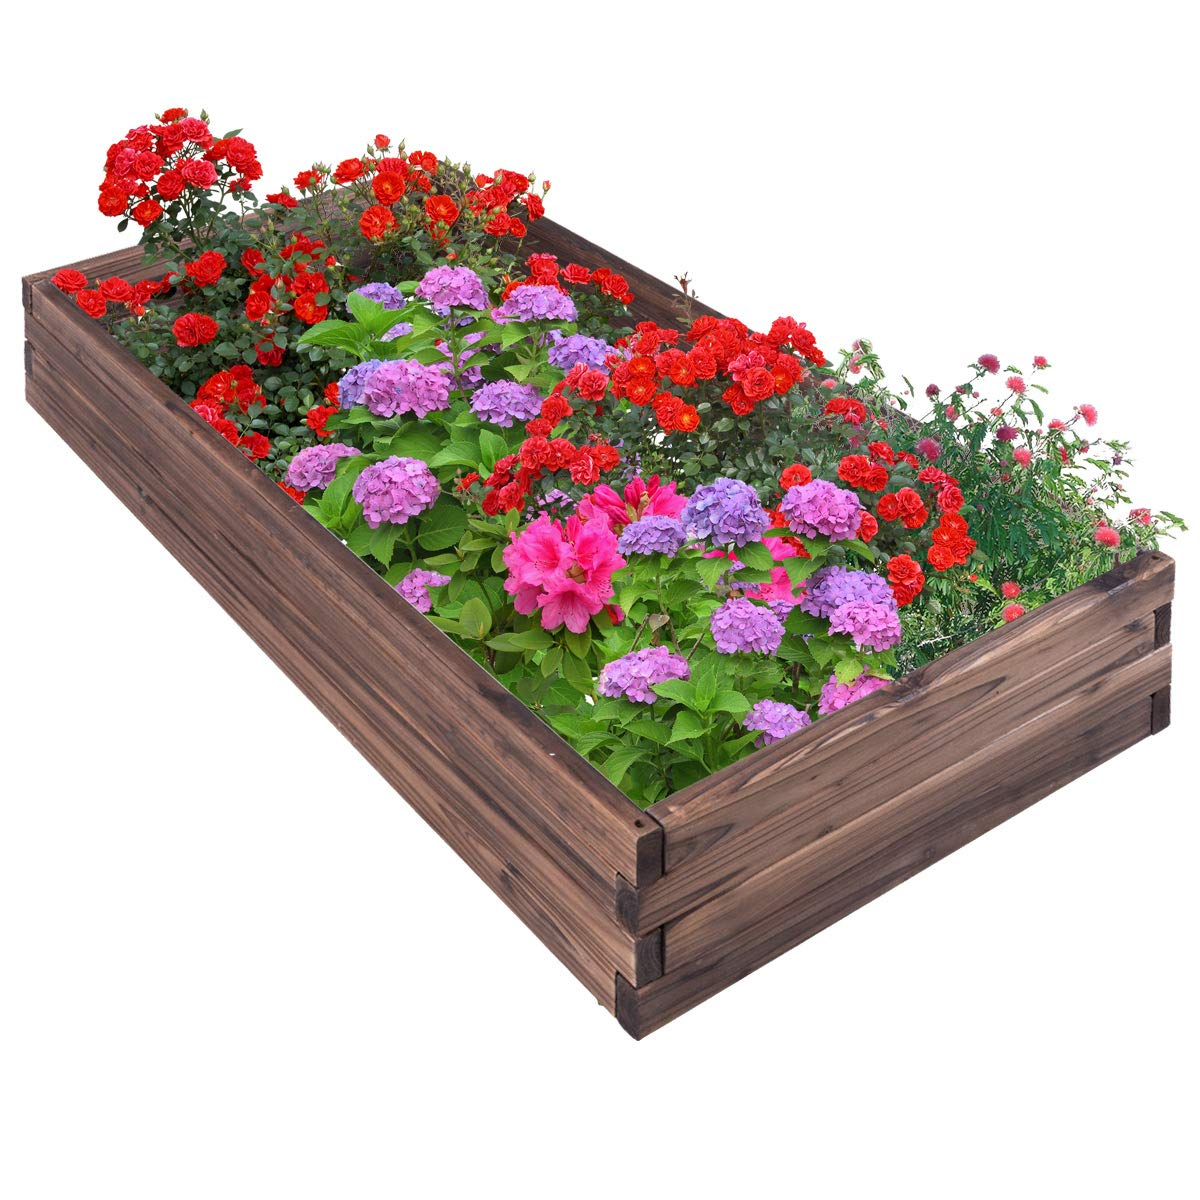 Giantex Raised Garden Bed Wood Outdoor Patio Vegetable Flower Rectangular Planter (Brown)